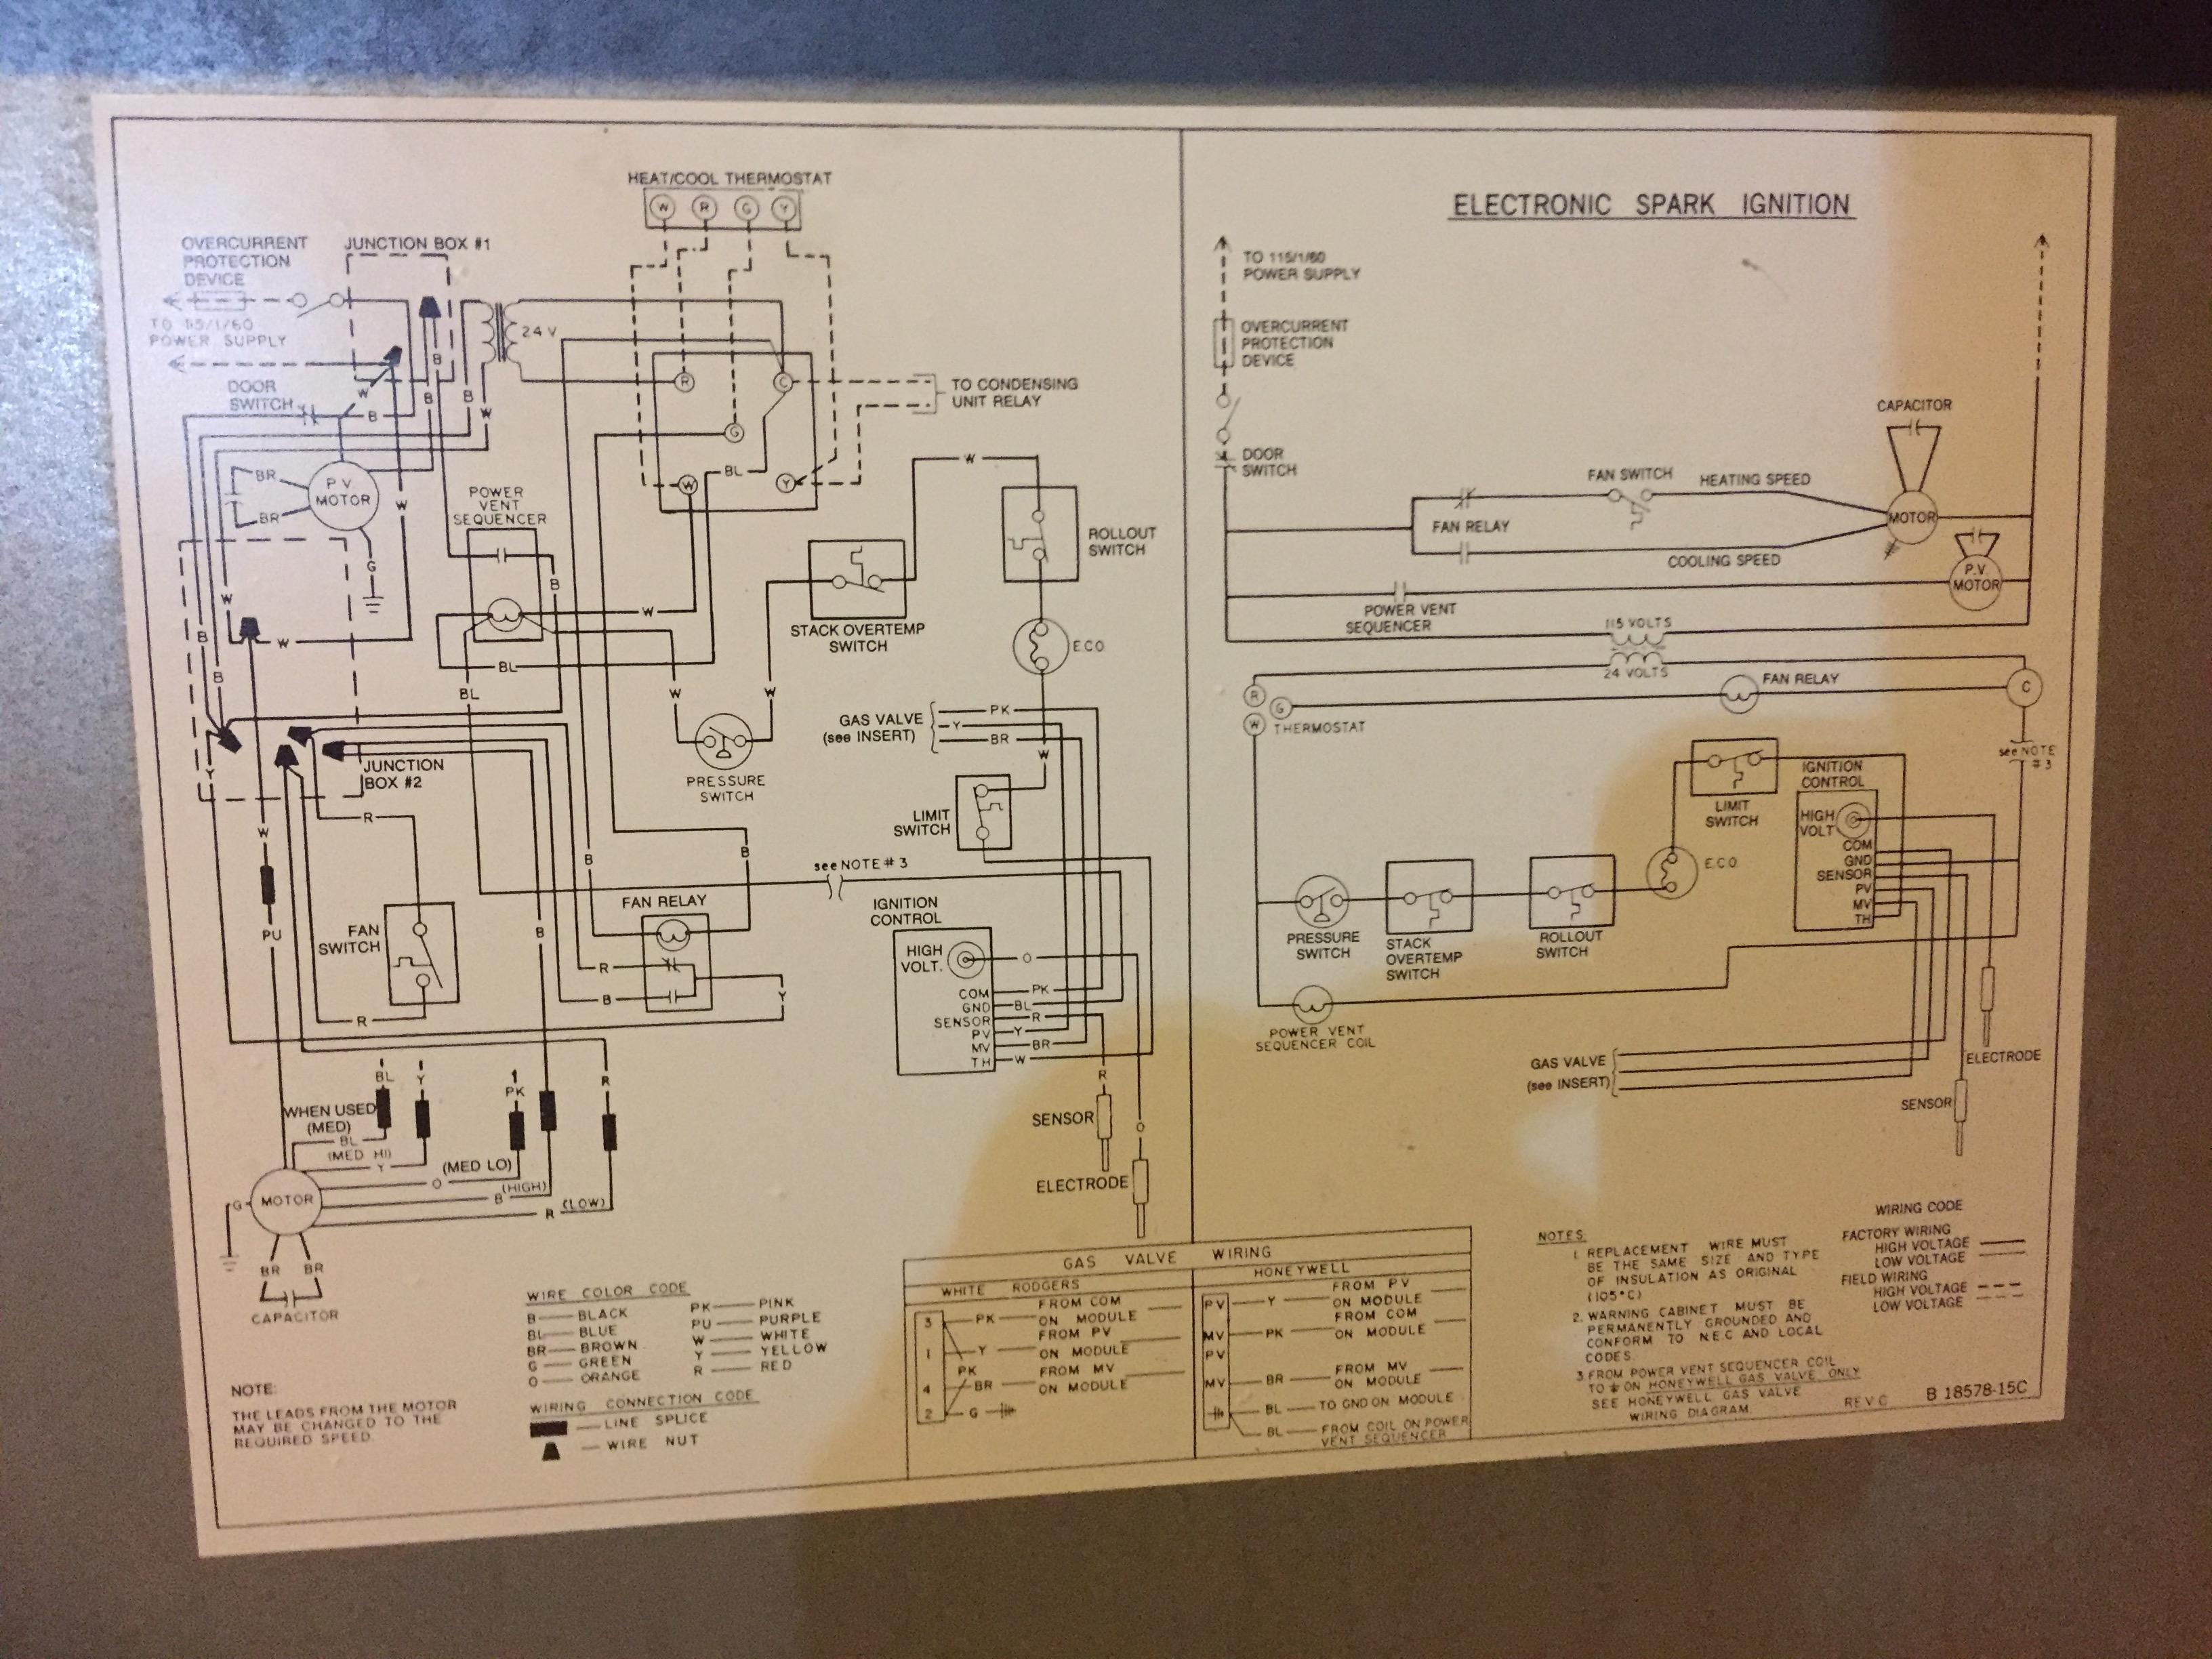 Goodman/janitrol gun100-4 92%. t-stat calls for heat ... on marvair wiring diagram, centurion wiring diagram, weather king wiring diagram, general wiring diagram, heat controller wiring diagram, evcon wiring diagram, sears wiring diagram, roper wiring diagram, viking wiring diagram, johnson controls wiring diagram, concord wiring diagram, lochinvar wiring diagram, panasonic wiring diagram, estate wiring diagram, broan wiring diagram, crosley wiring diagram, payne wiring diagram, columbia wiring diagram, climatrol wiring diagram, goettl wiring diagram,